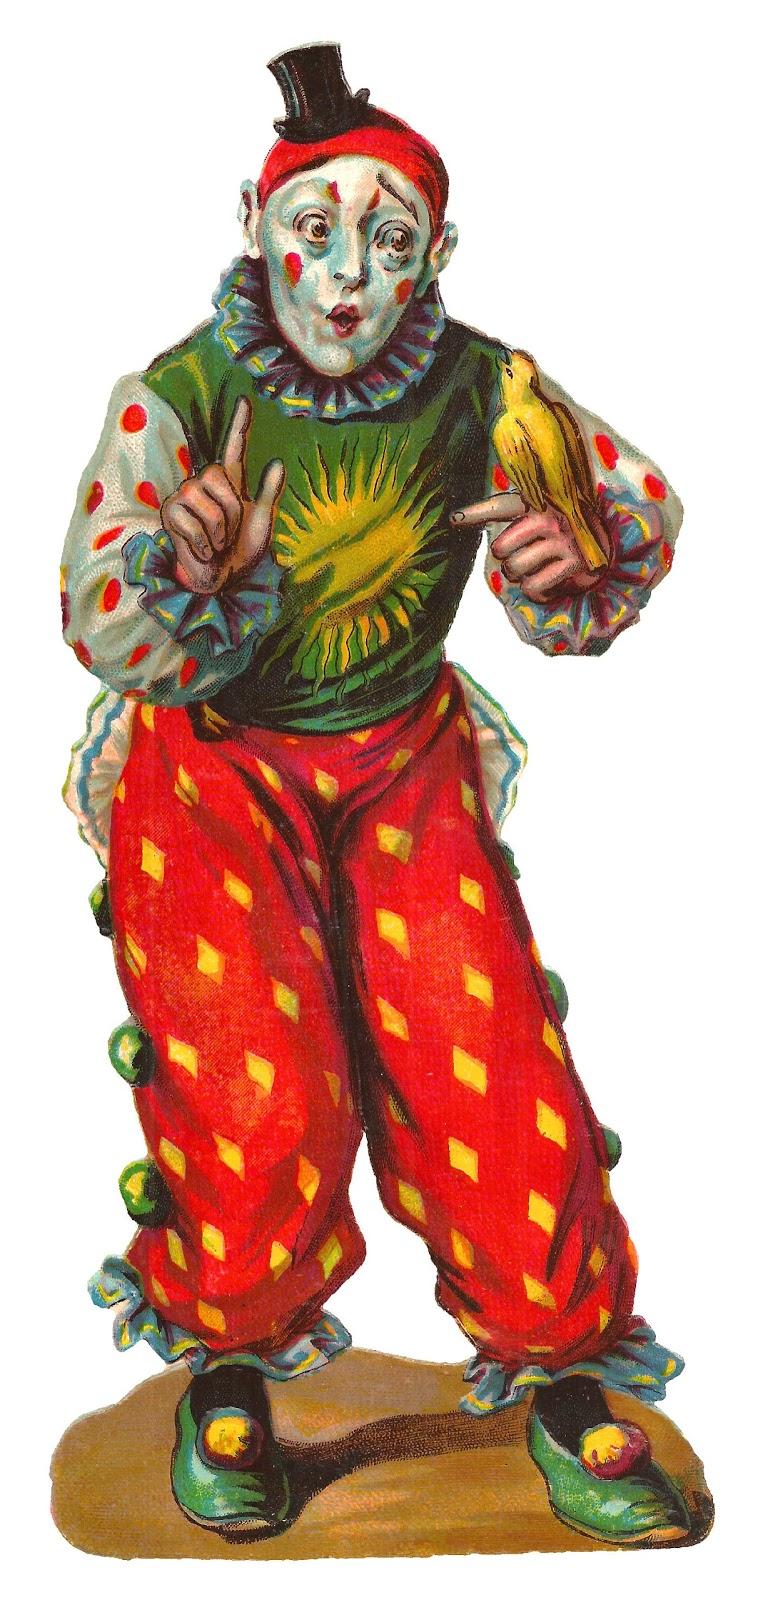 Clown Circus Vintage Clipart Digital Download Illustration